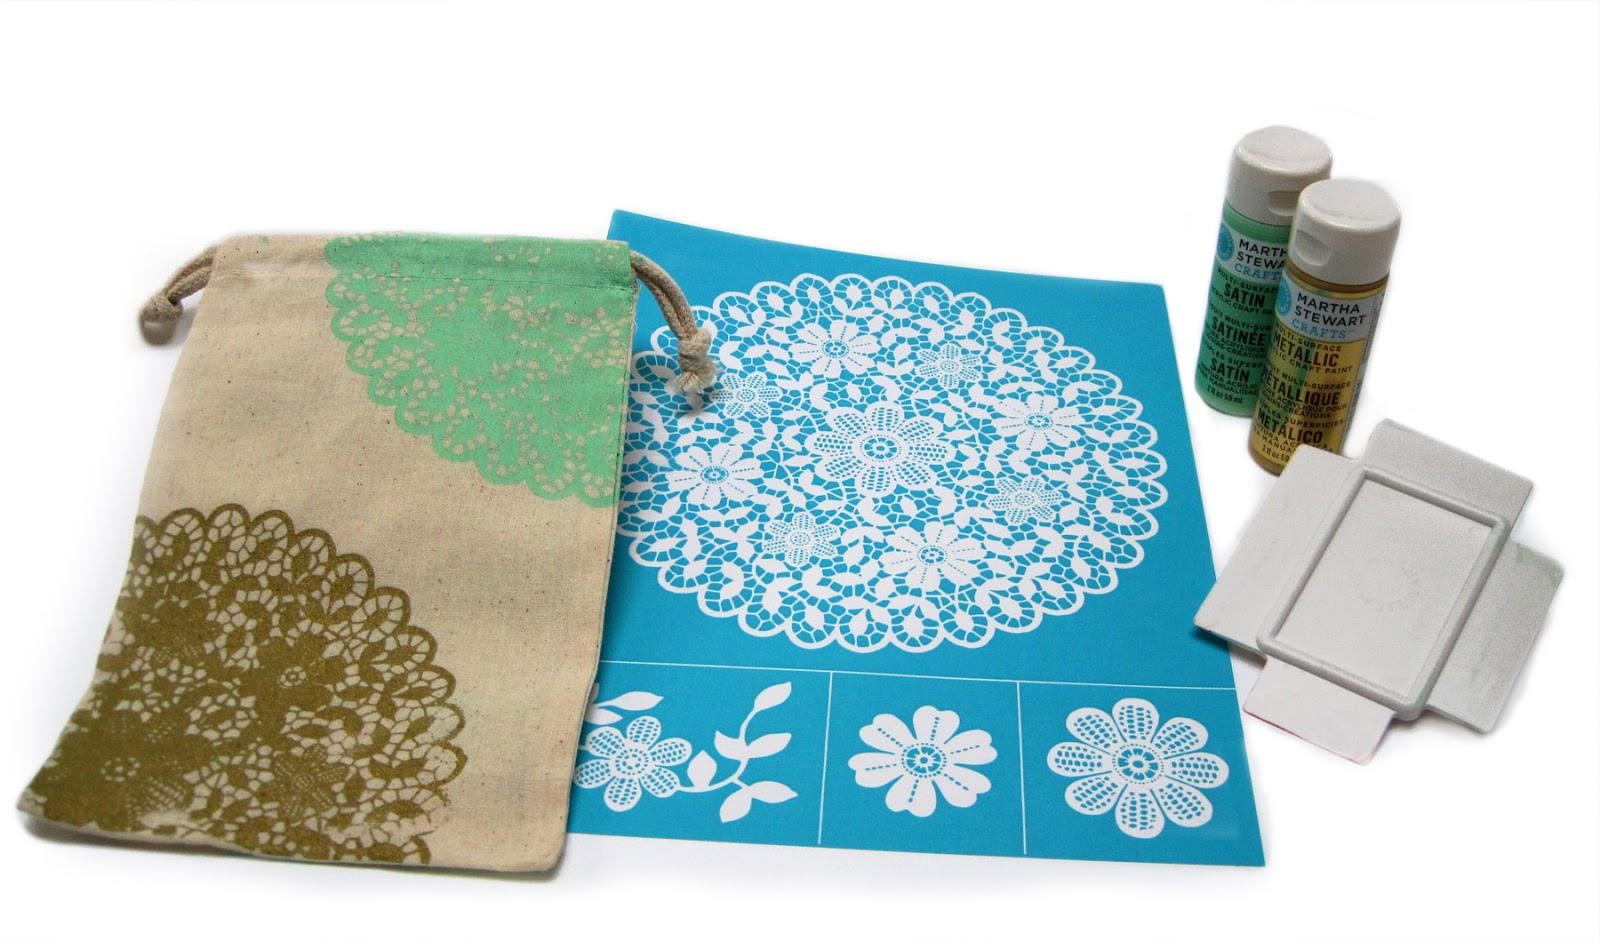 Paper minded decorating muslin burlap bags for Decorative burlap bags